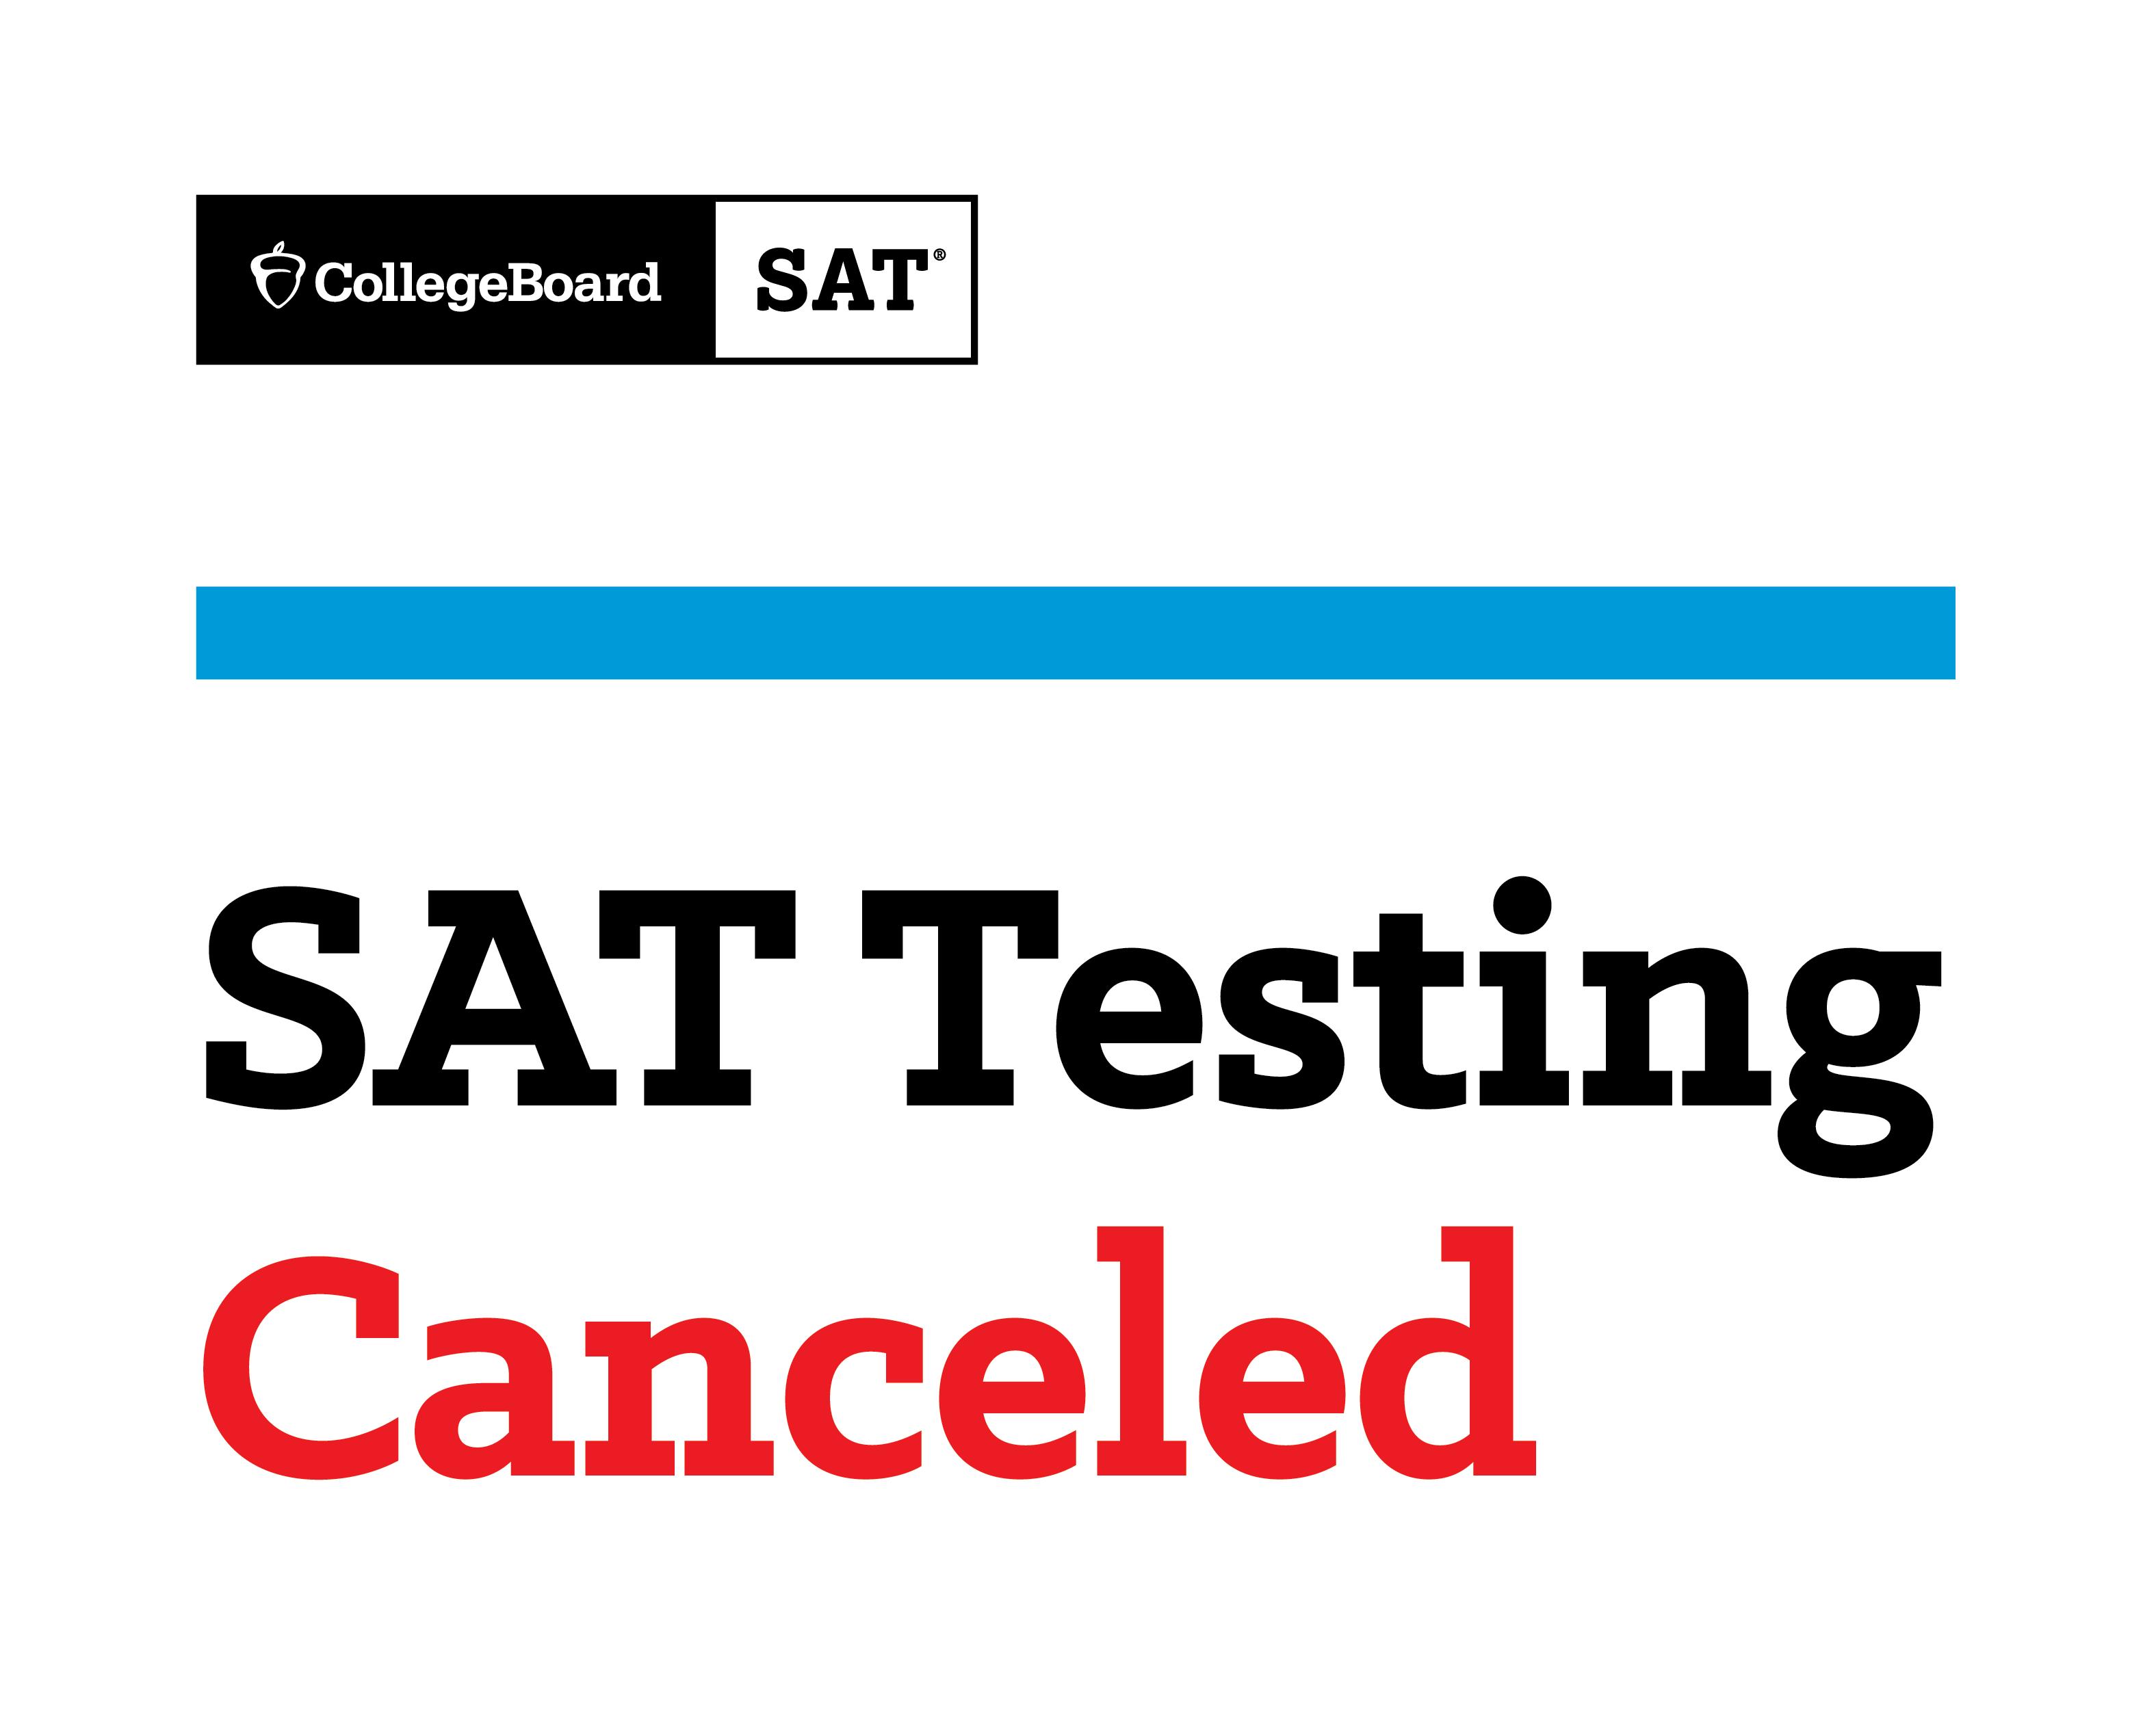 SAT Testing Canceled